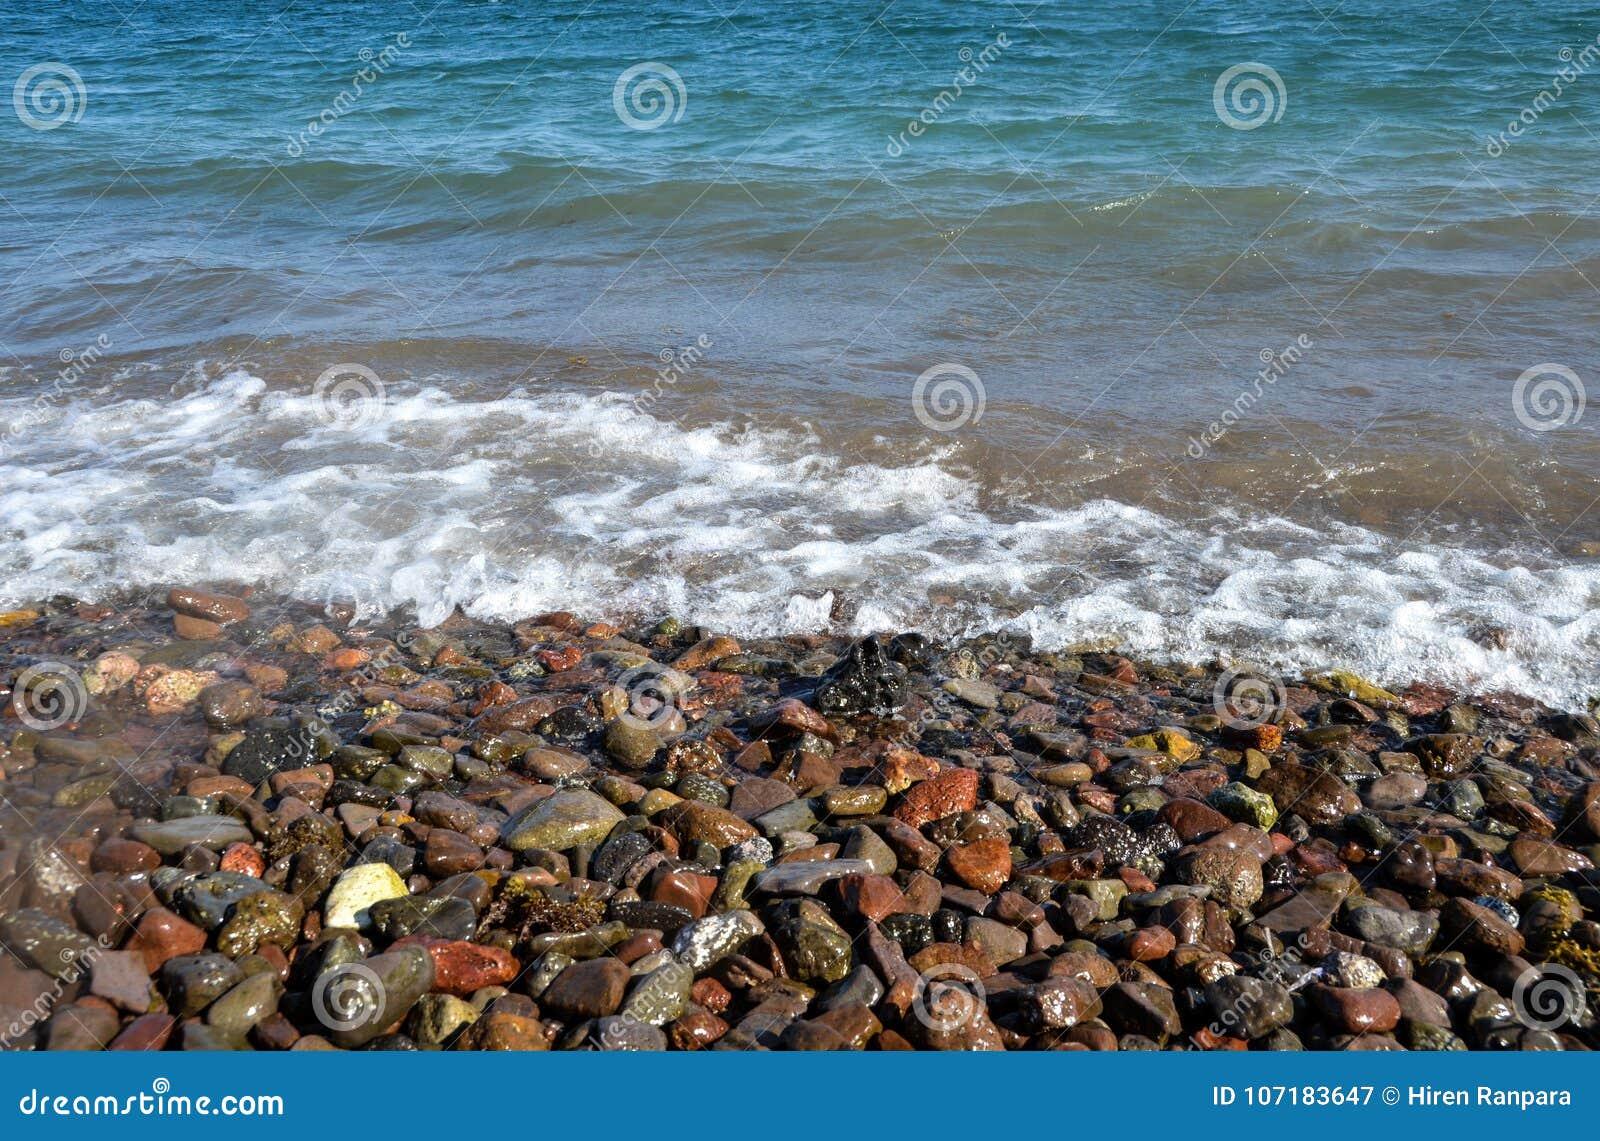 ghoubet beach devils island ghoubbet el kharab djibouti east africa